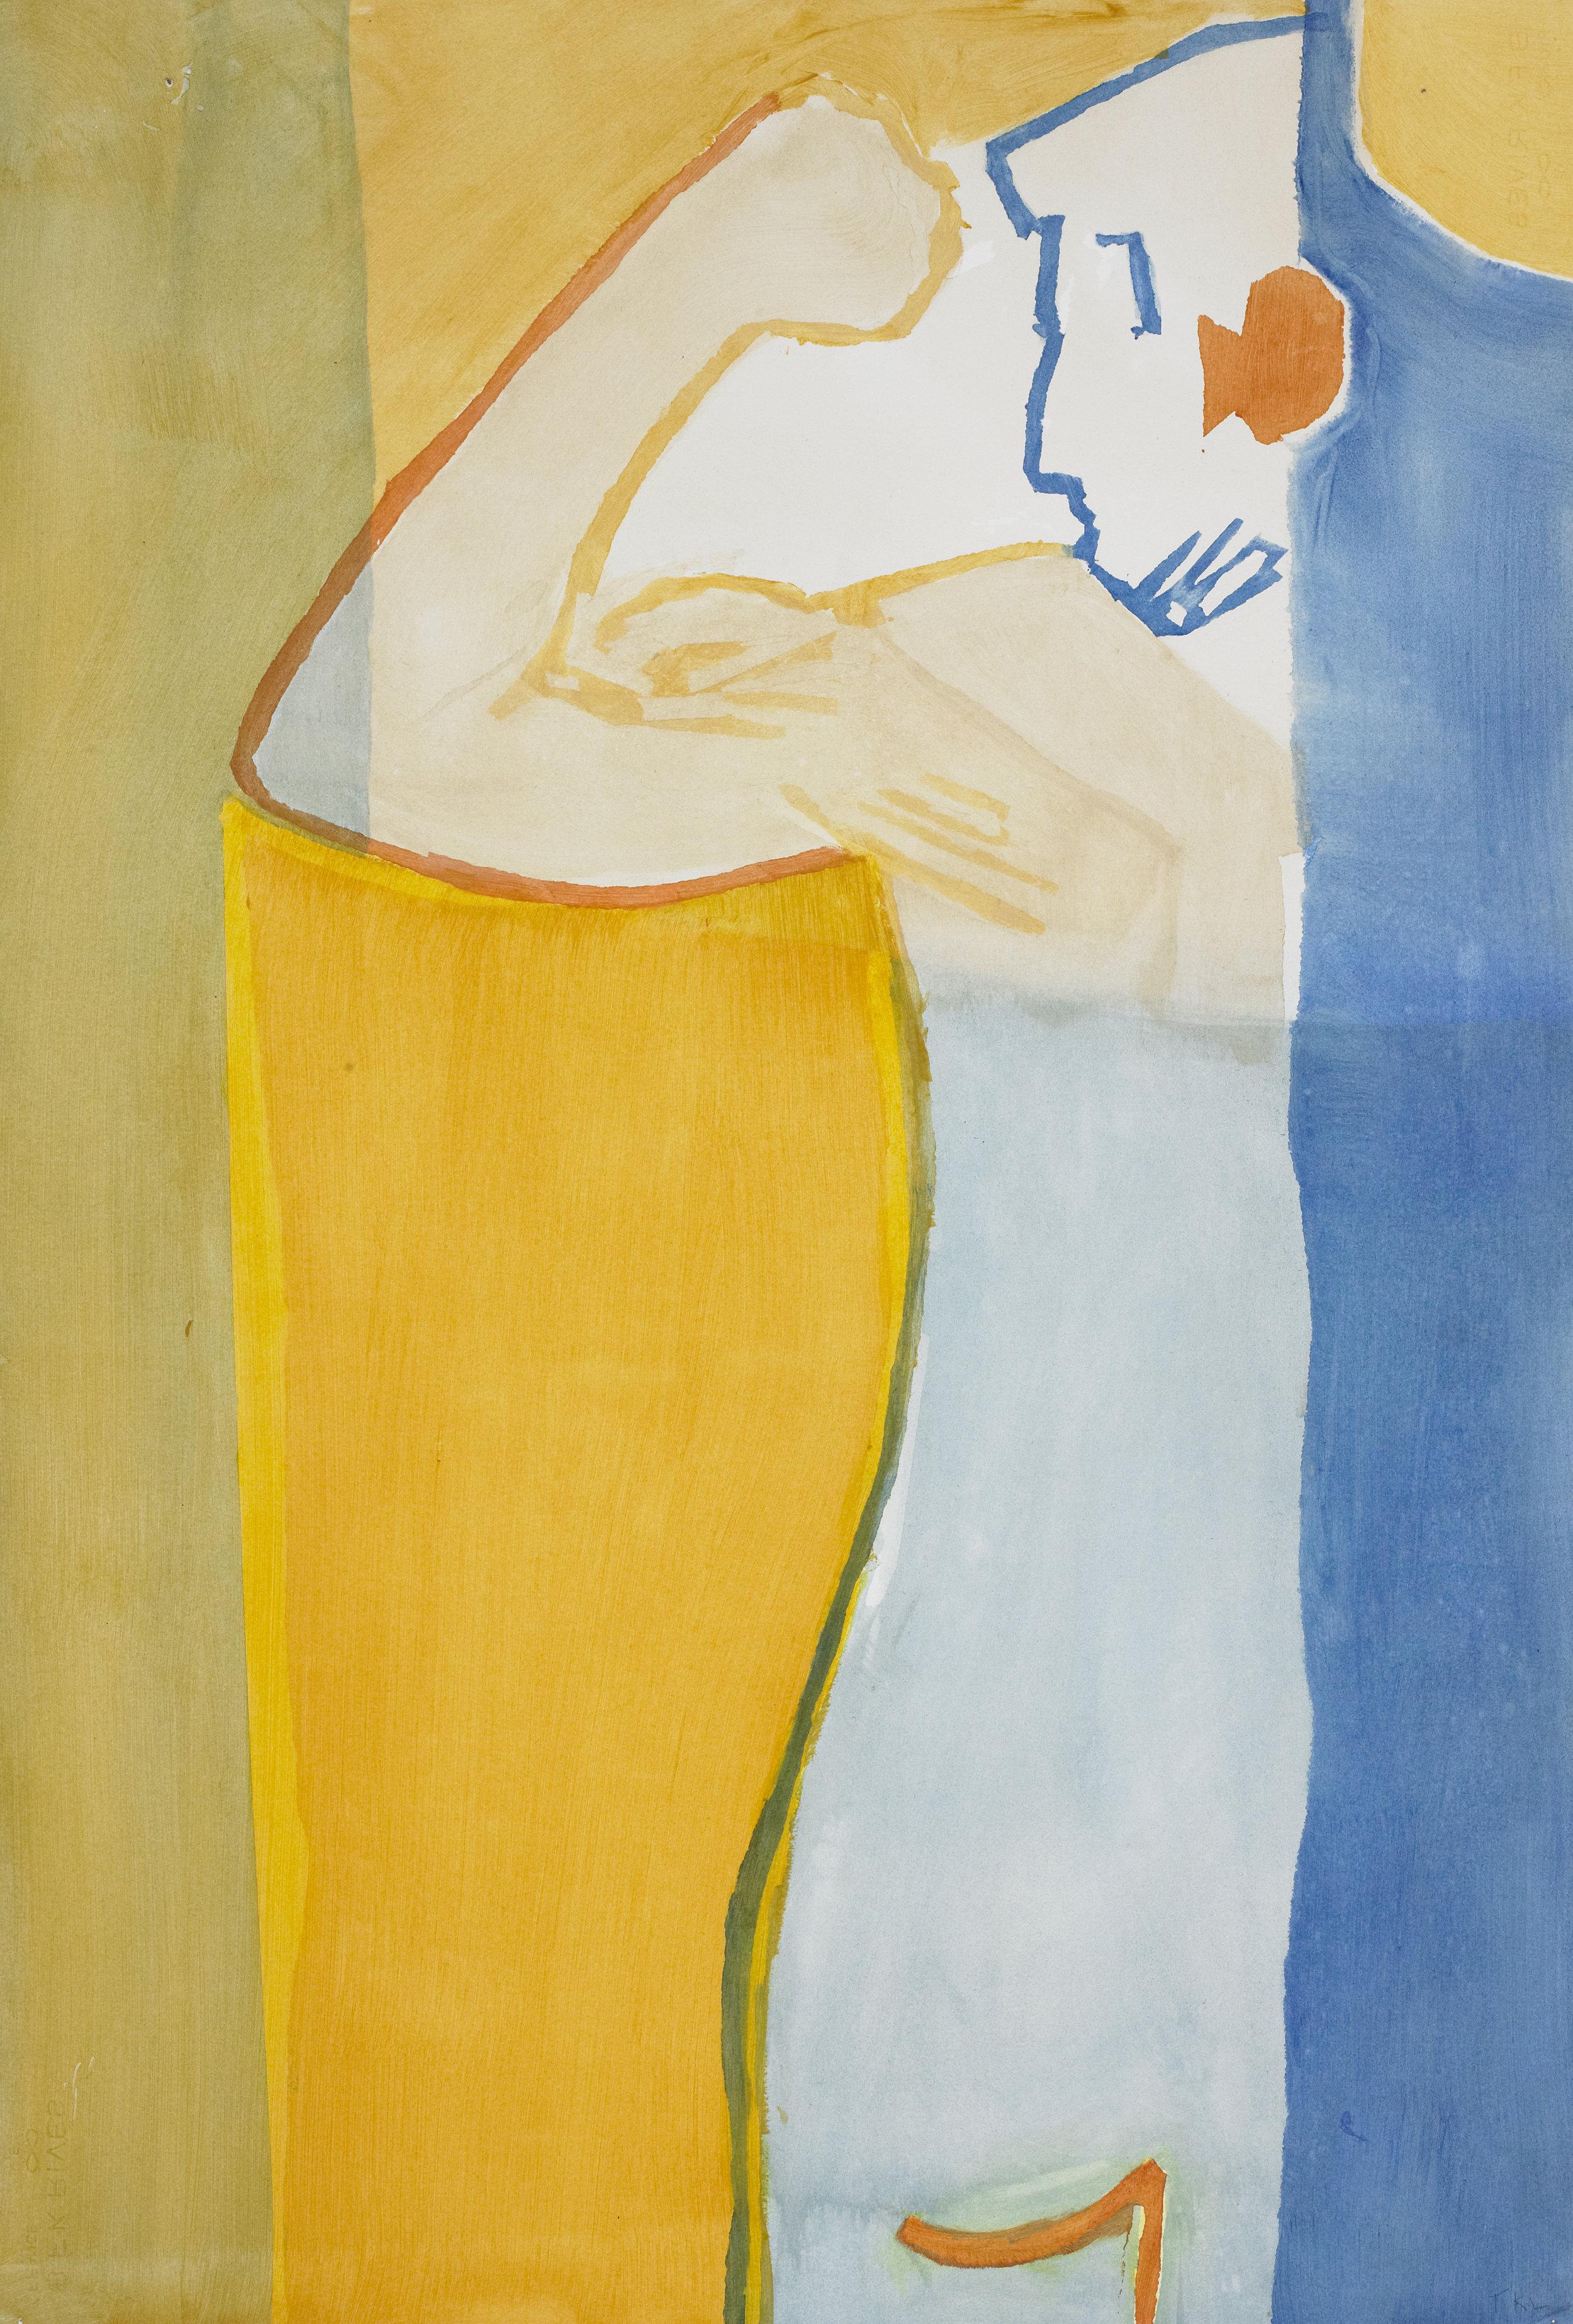 Pessoa Home , acrylic on paper on panel, 2016